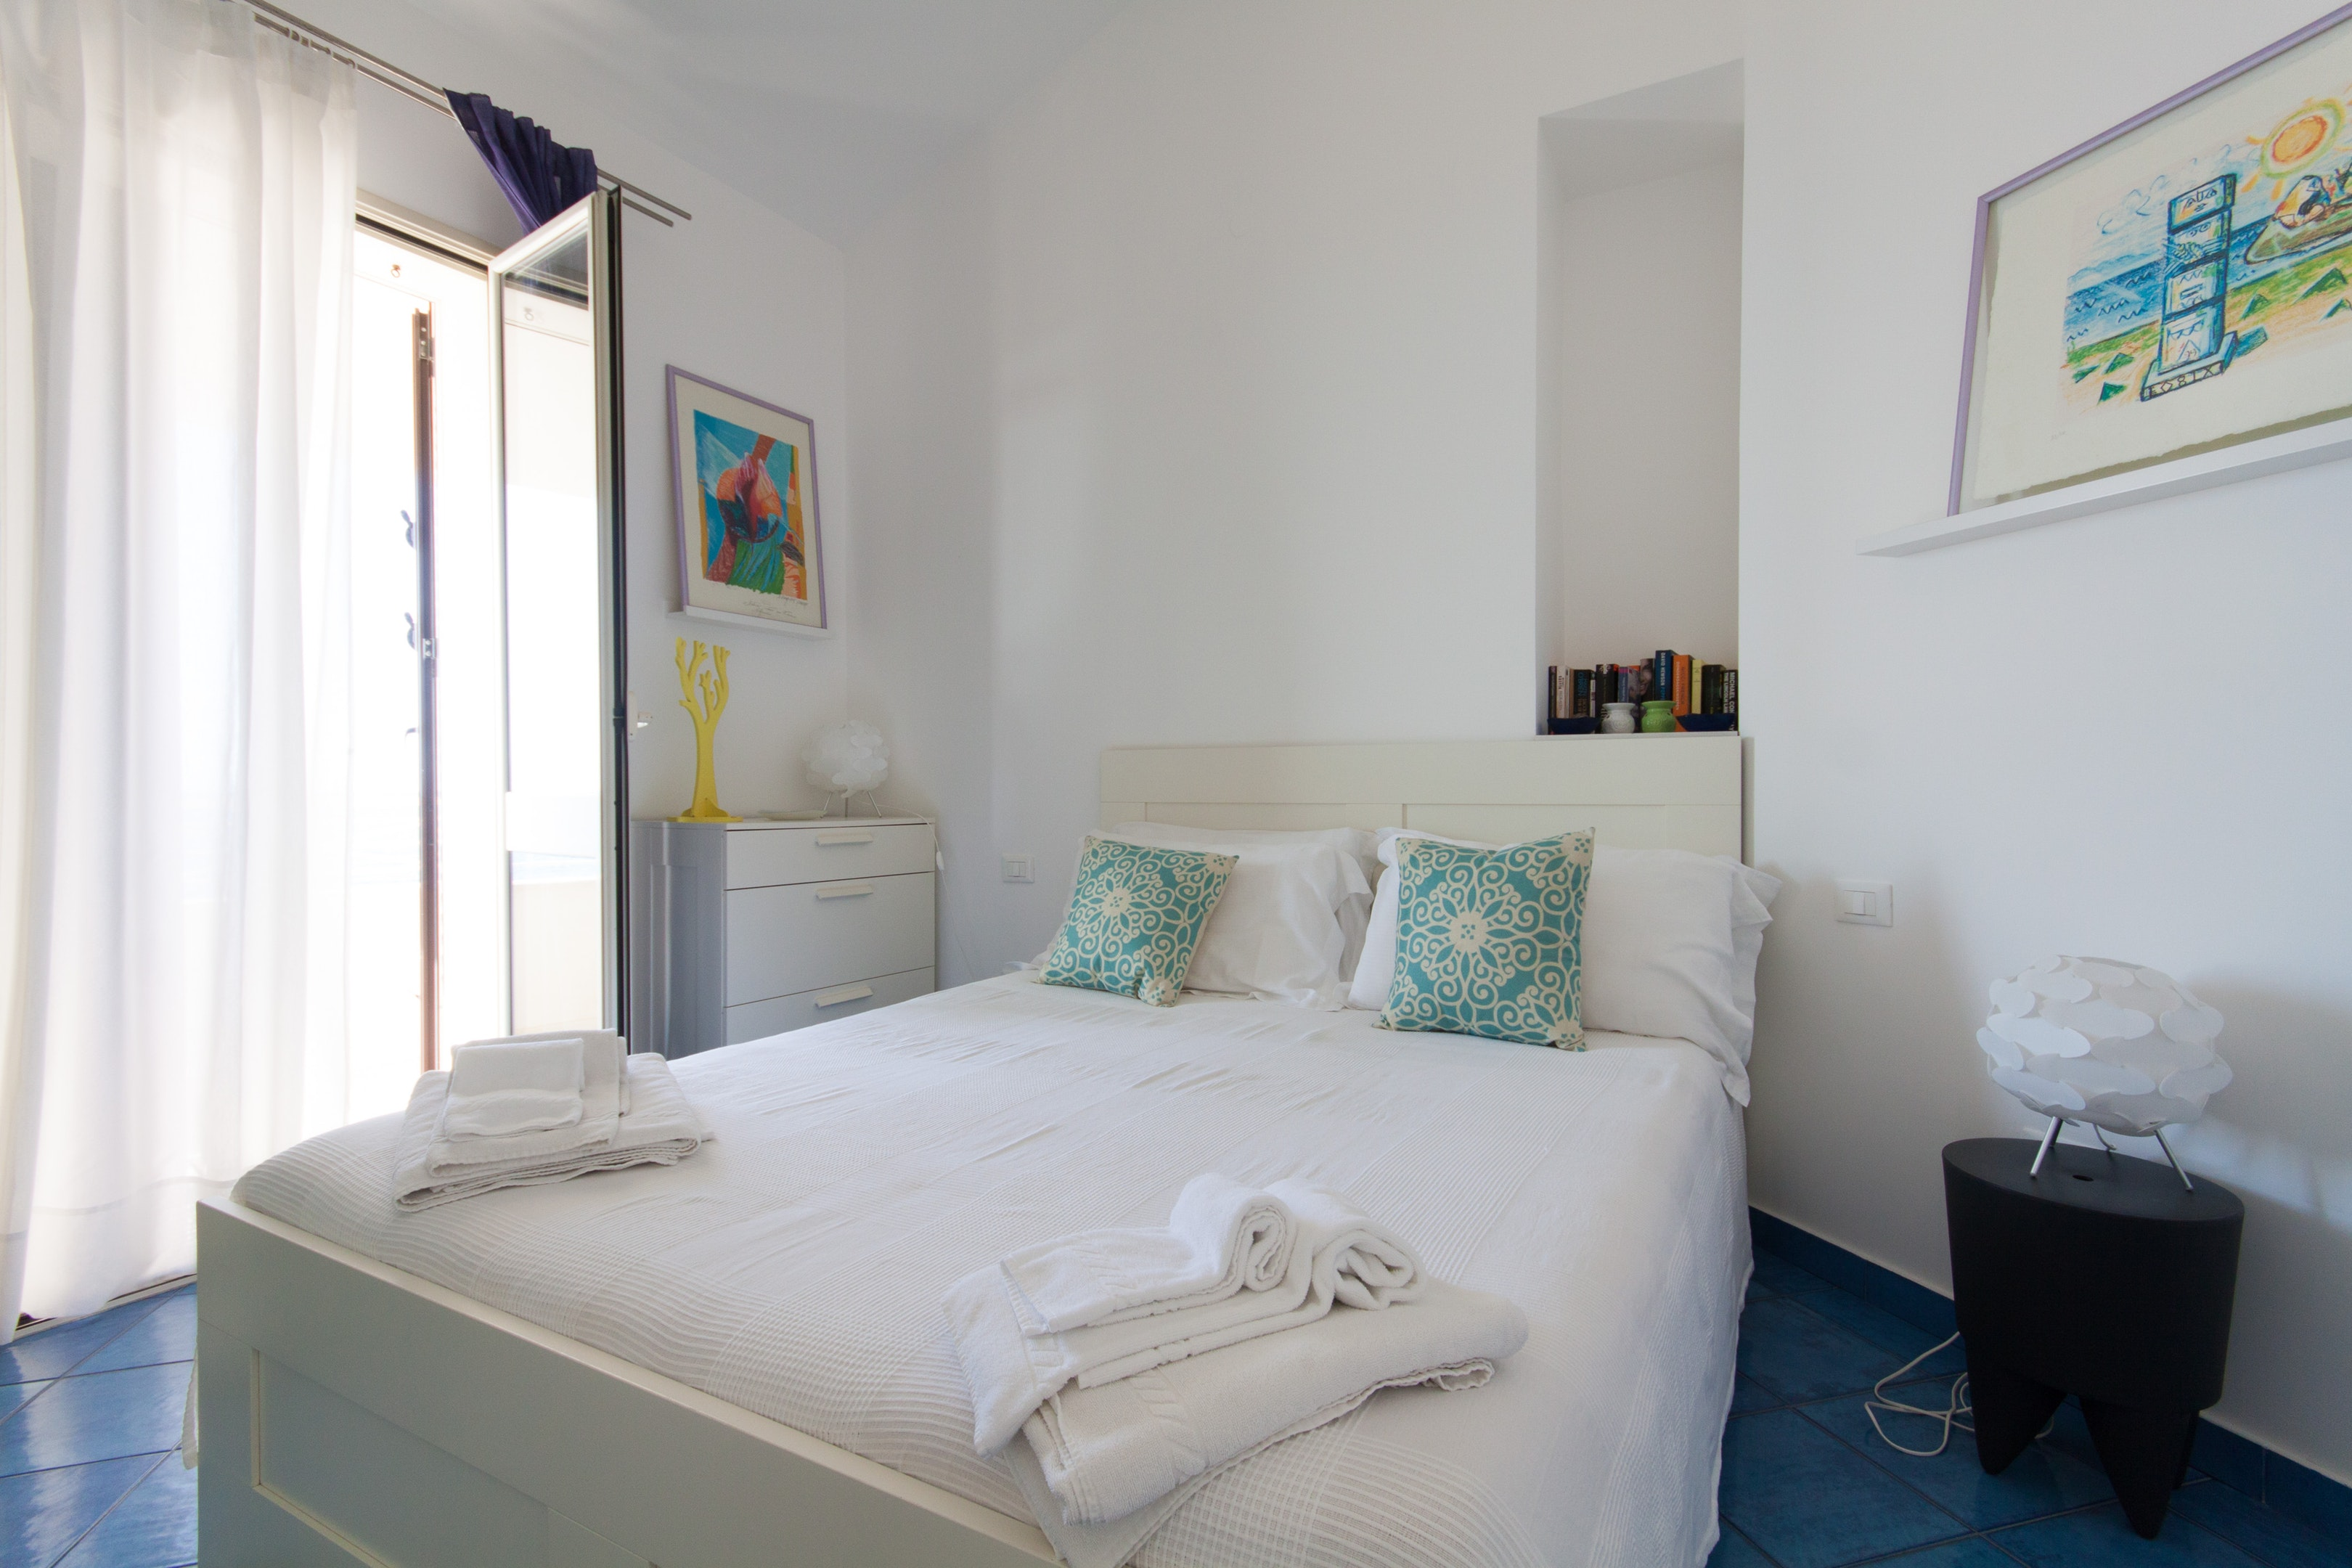 Holiday apartment Wohnung mit 3 Schlafzimmern in Piano di Trappeto mit herrlichem Meerblick, möblierter Terr (2271436), Balestrate, Palermo, Sicily, Italy, picture 19